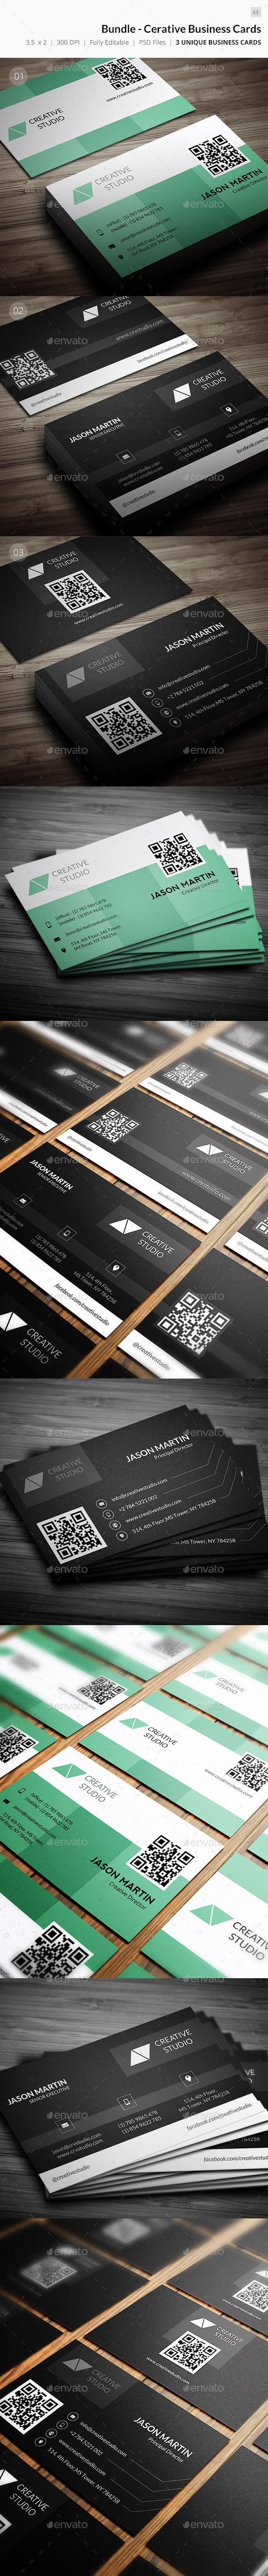 GraphicRiver Bundle Corporate Creative Business Card 63 10016783